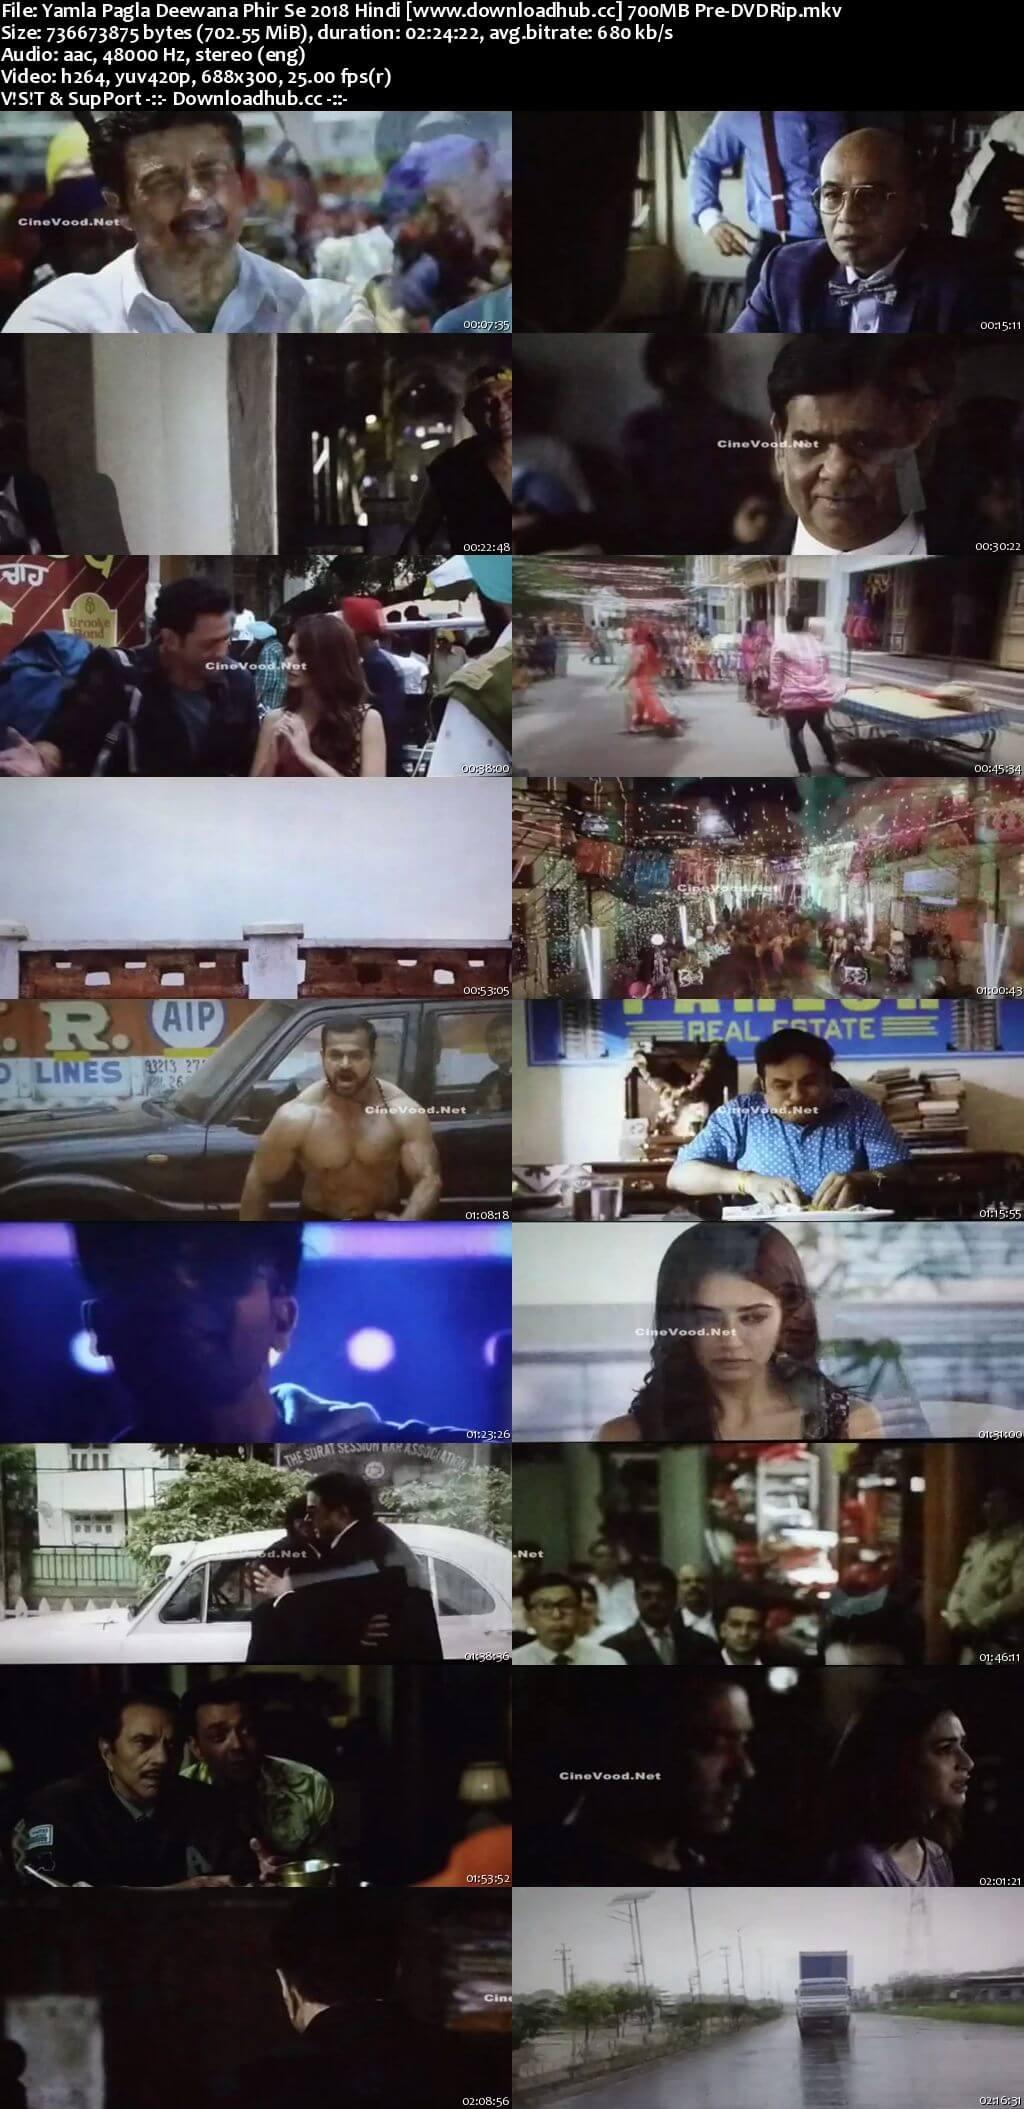 Yamla Pagla Deewana Phir Se 2018 Hindi 700MB Pre-DVDRip x264